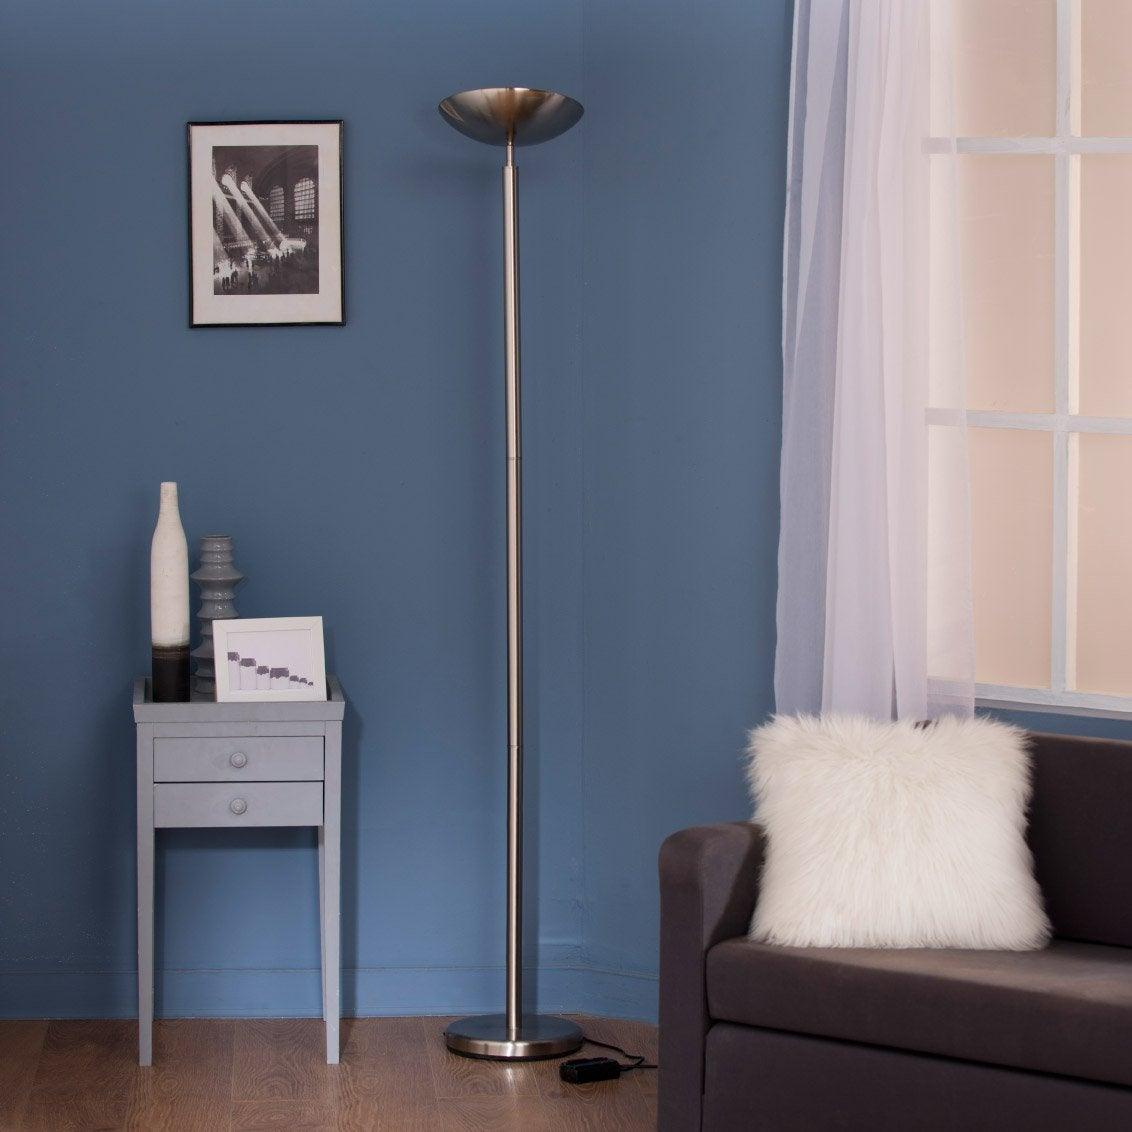 Lampe Bois Leroy Merlin : Lampadaire Color INSPIRE, 184 cm, gris, 230 W Leroy Merlin